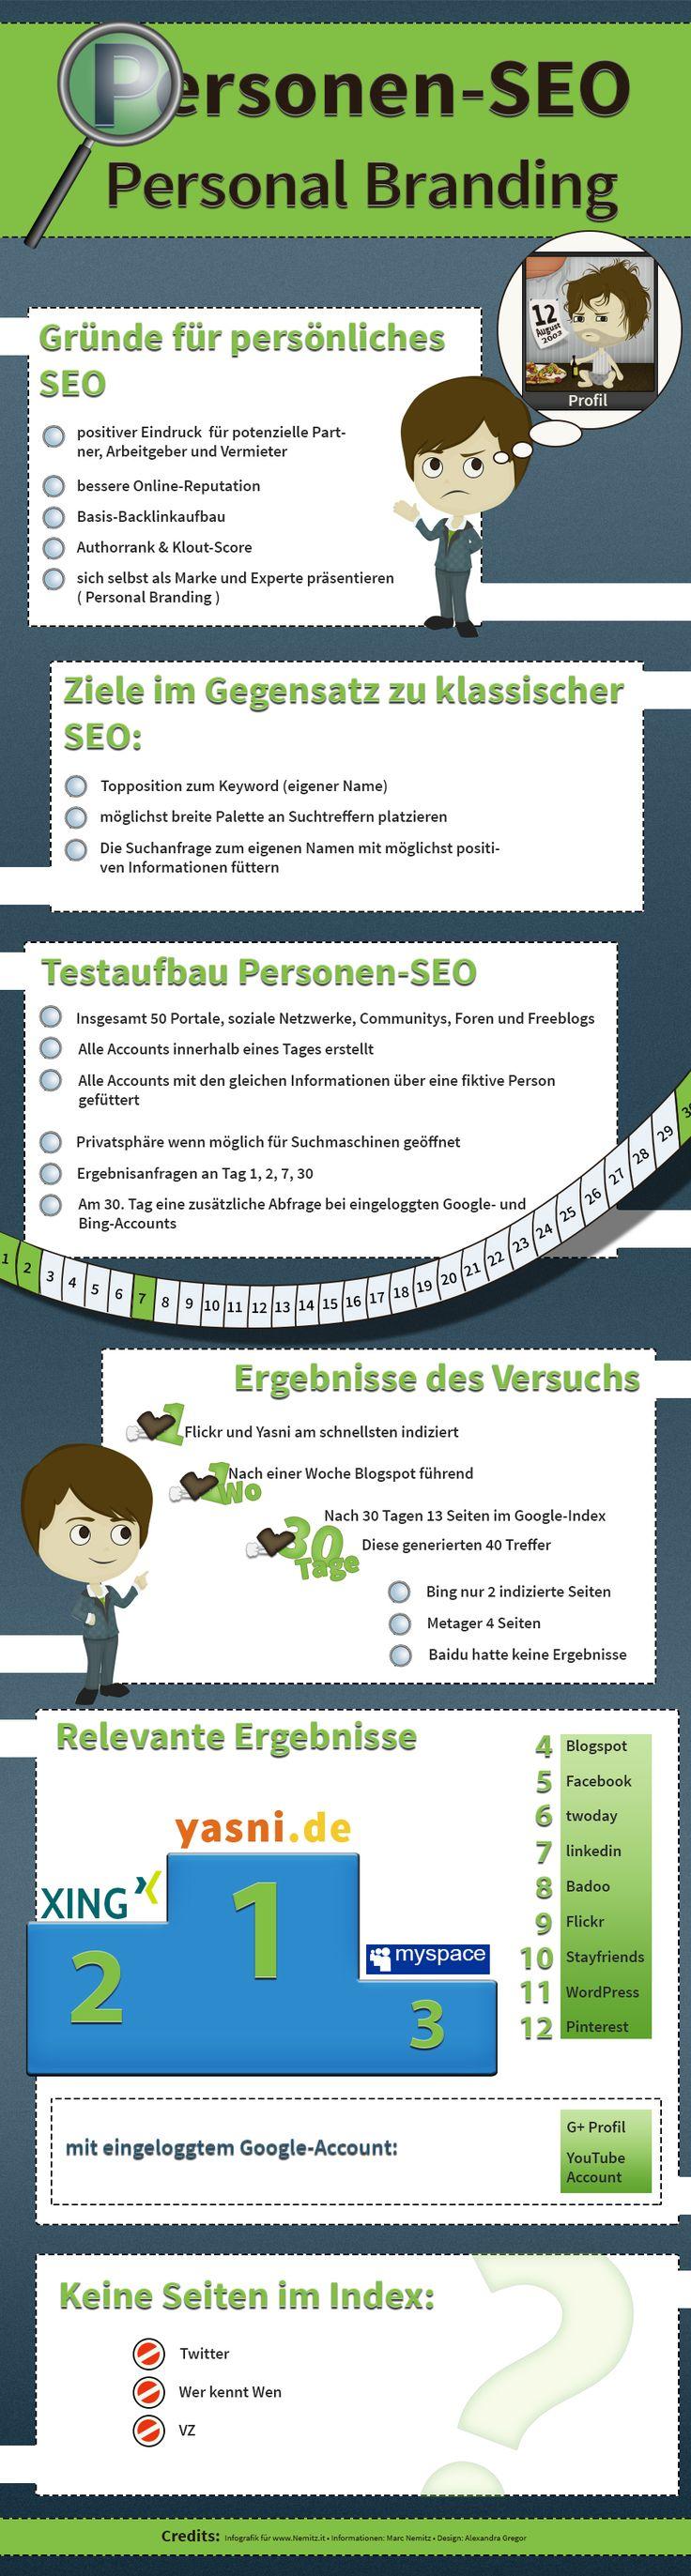 Personen-SEO Infografik - http://www.nemitz.it/seo/personen-seo-und-personal-branding/